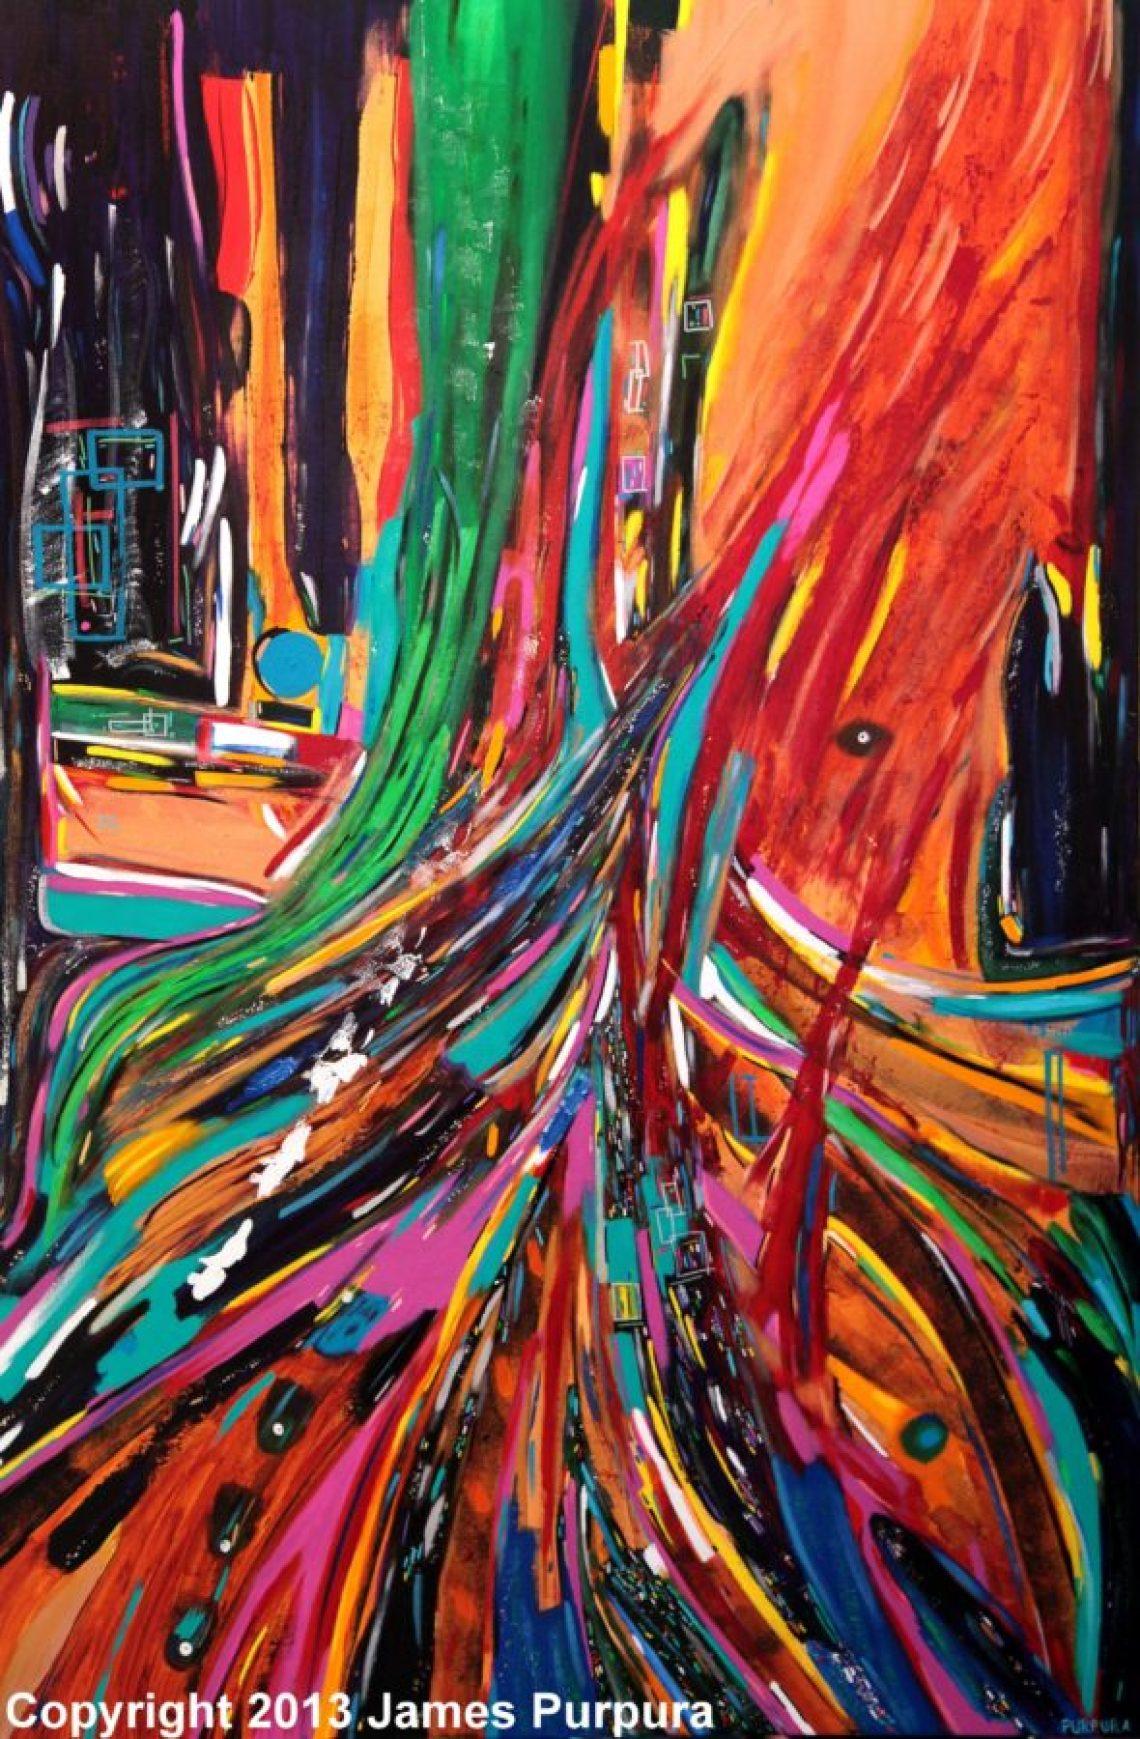 Heure de Pointe by James Purpura 100x150cm with Copyright